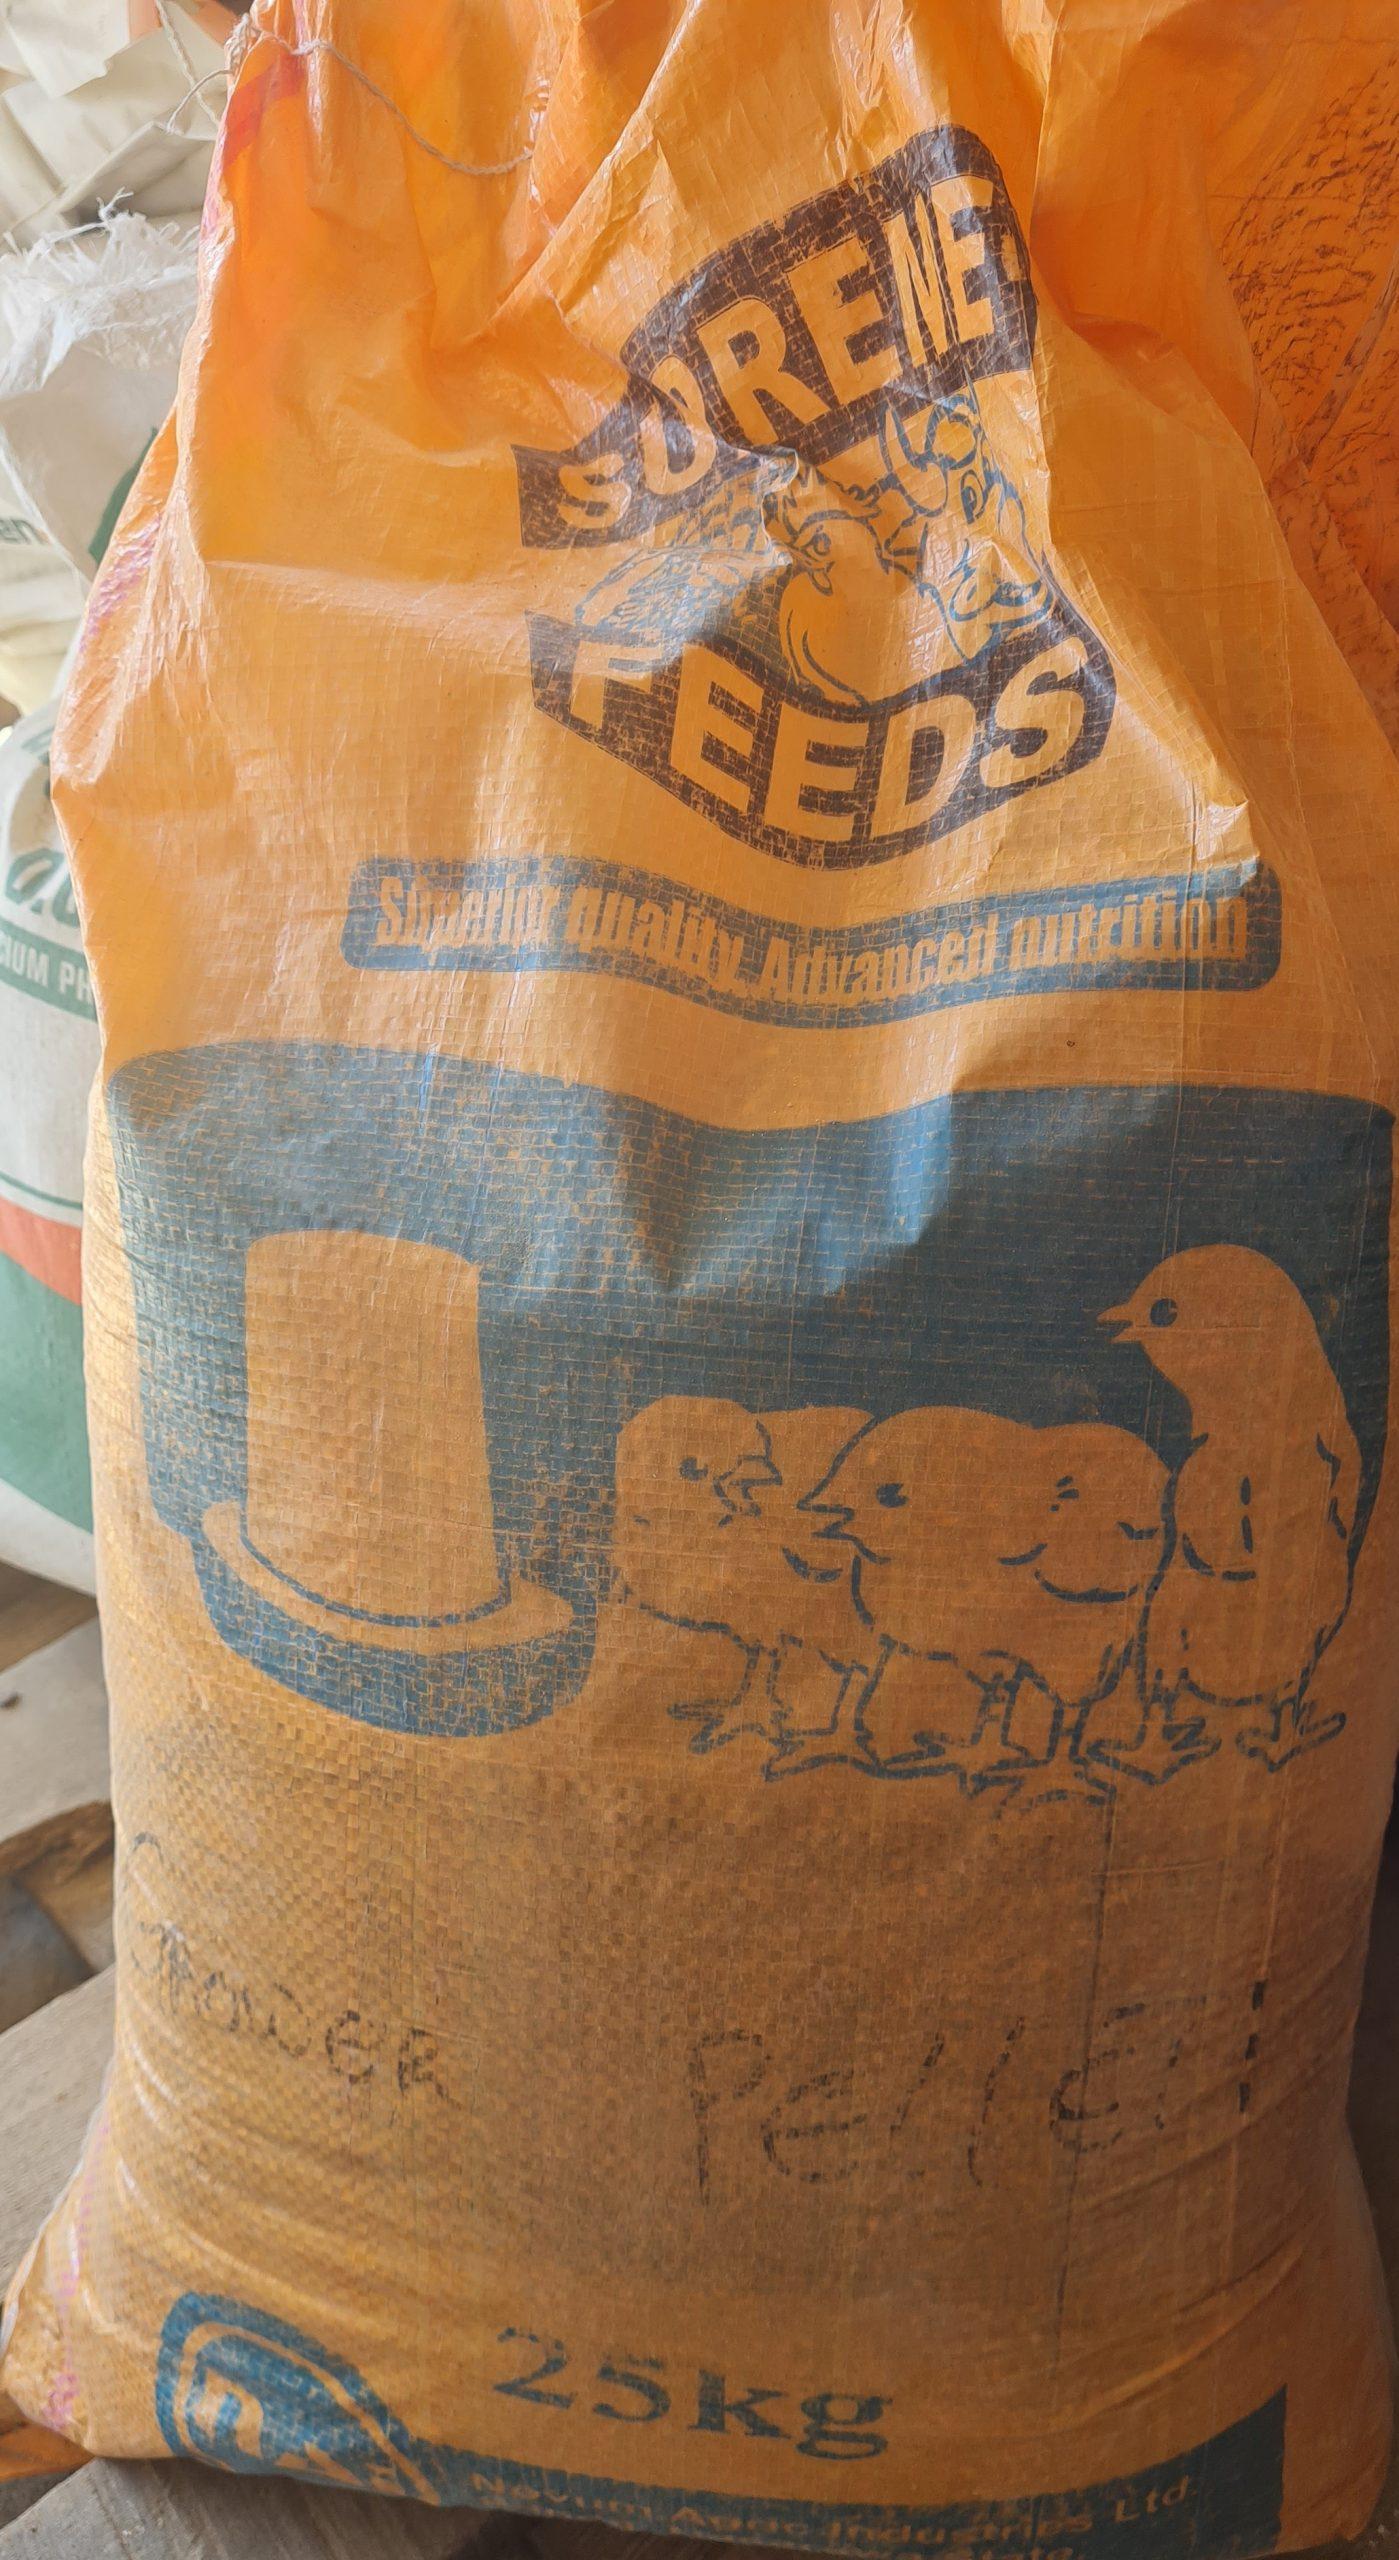 supreme feeds grower pellet